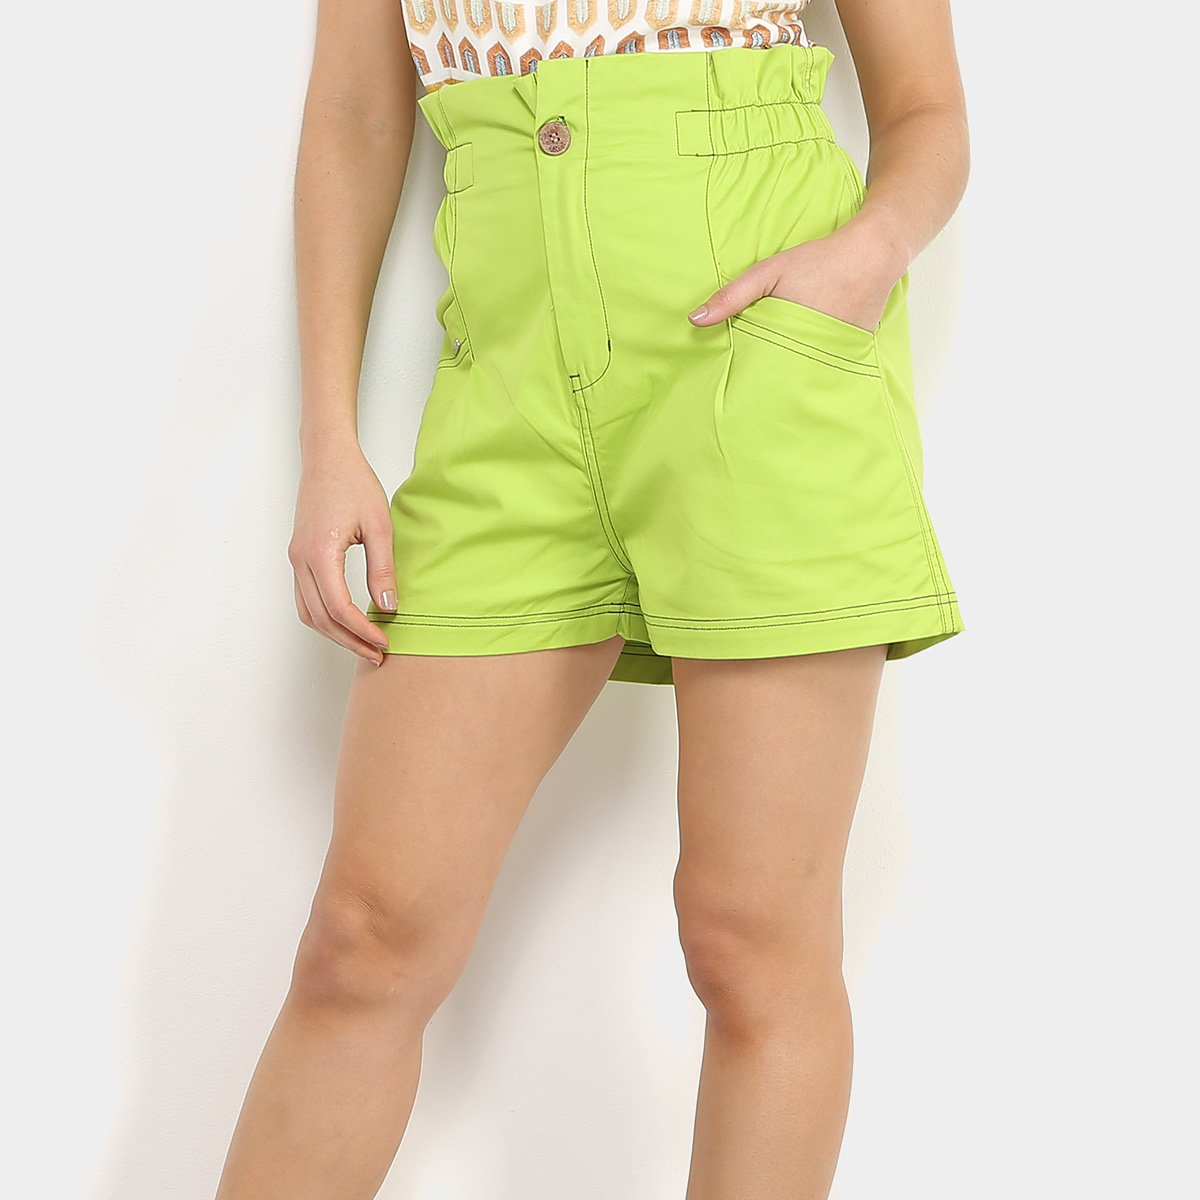 Shorts Colcci Clochard Feminino